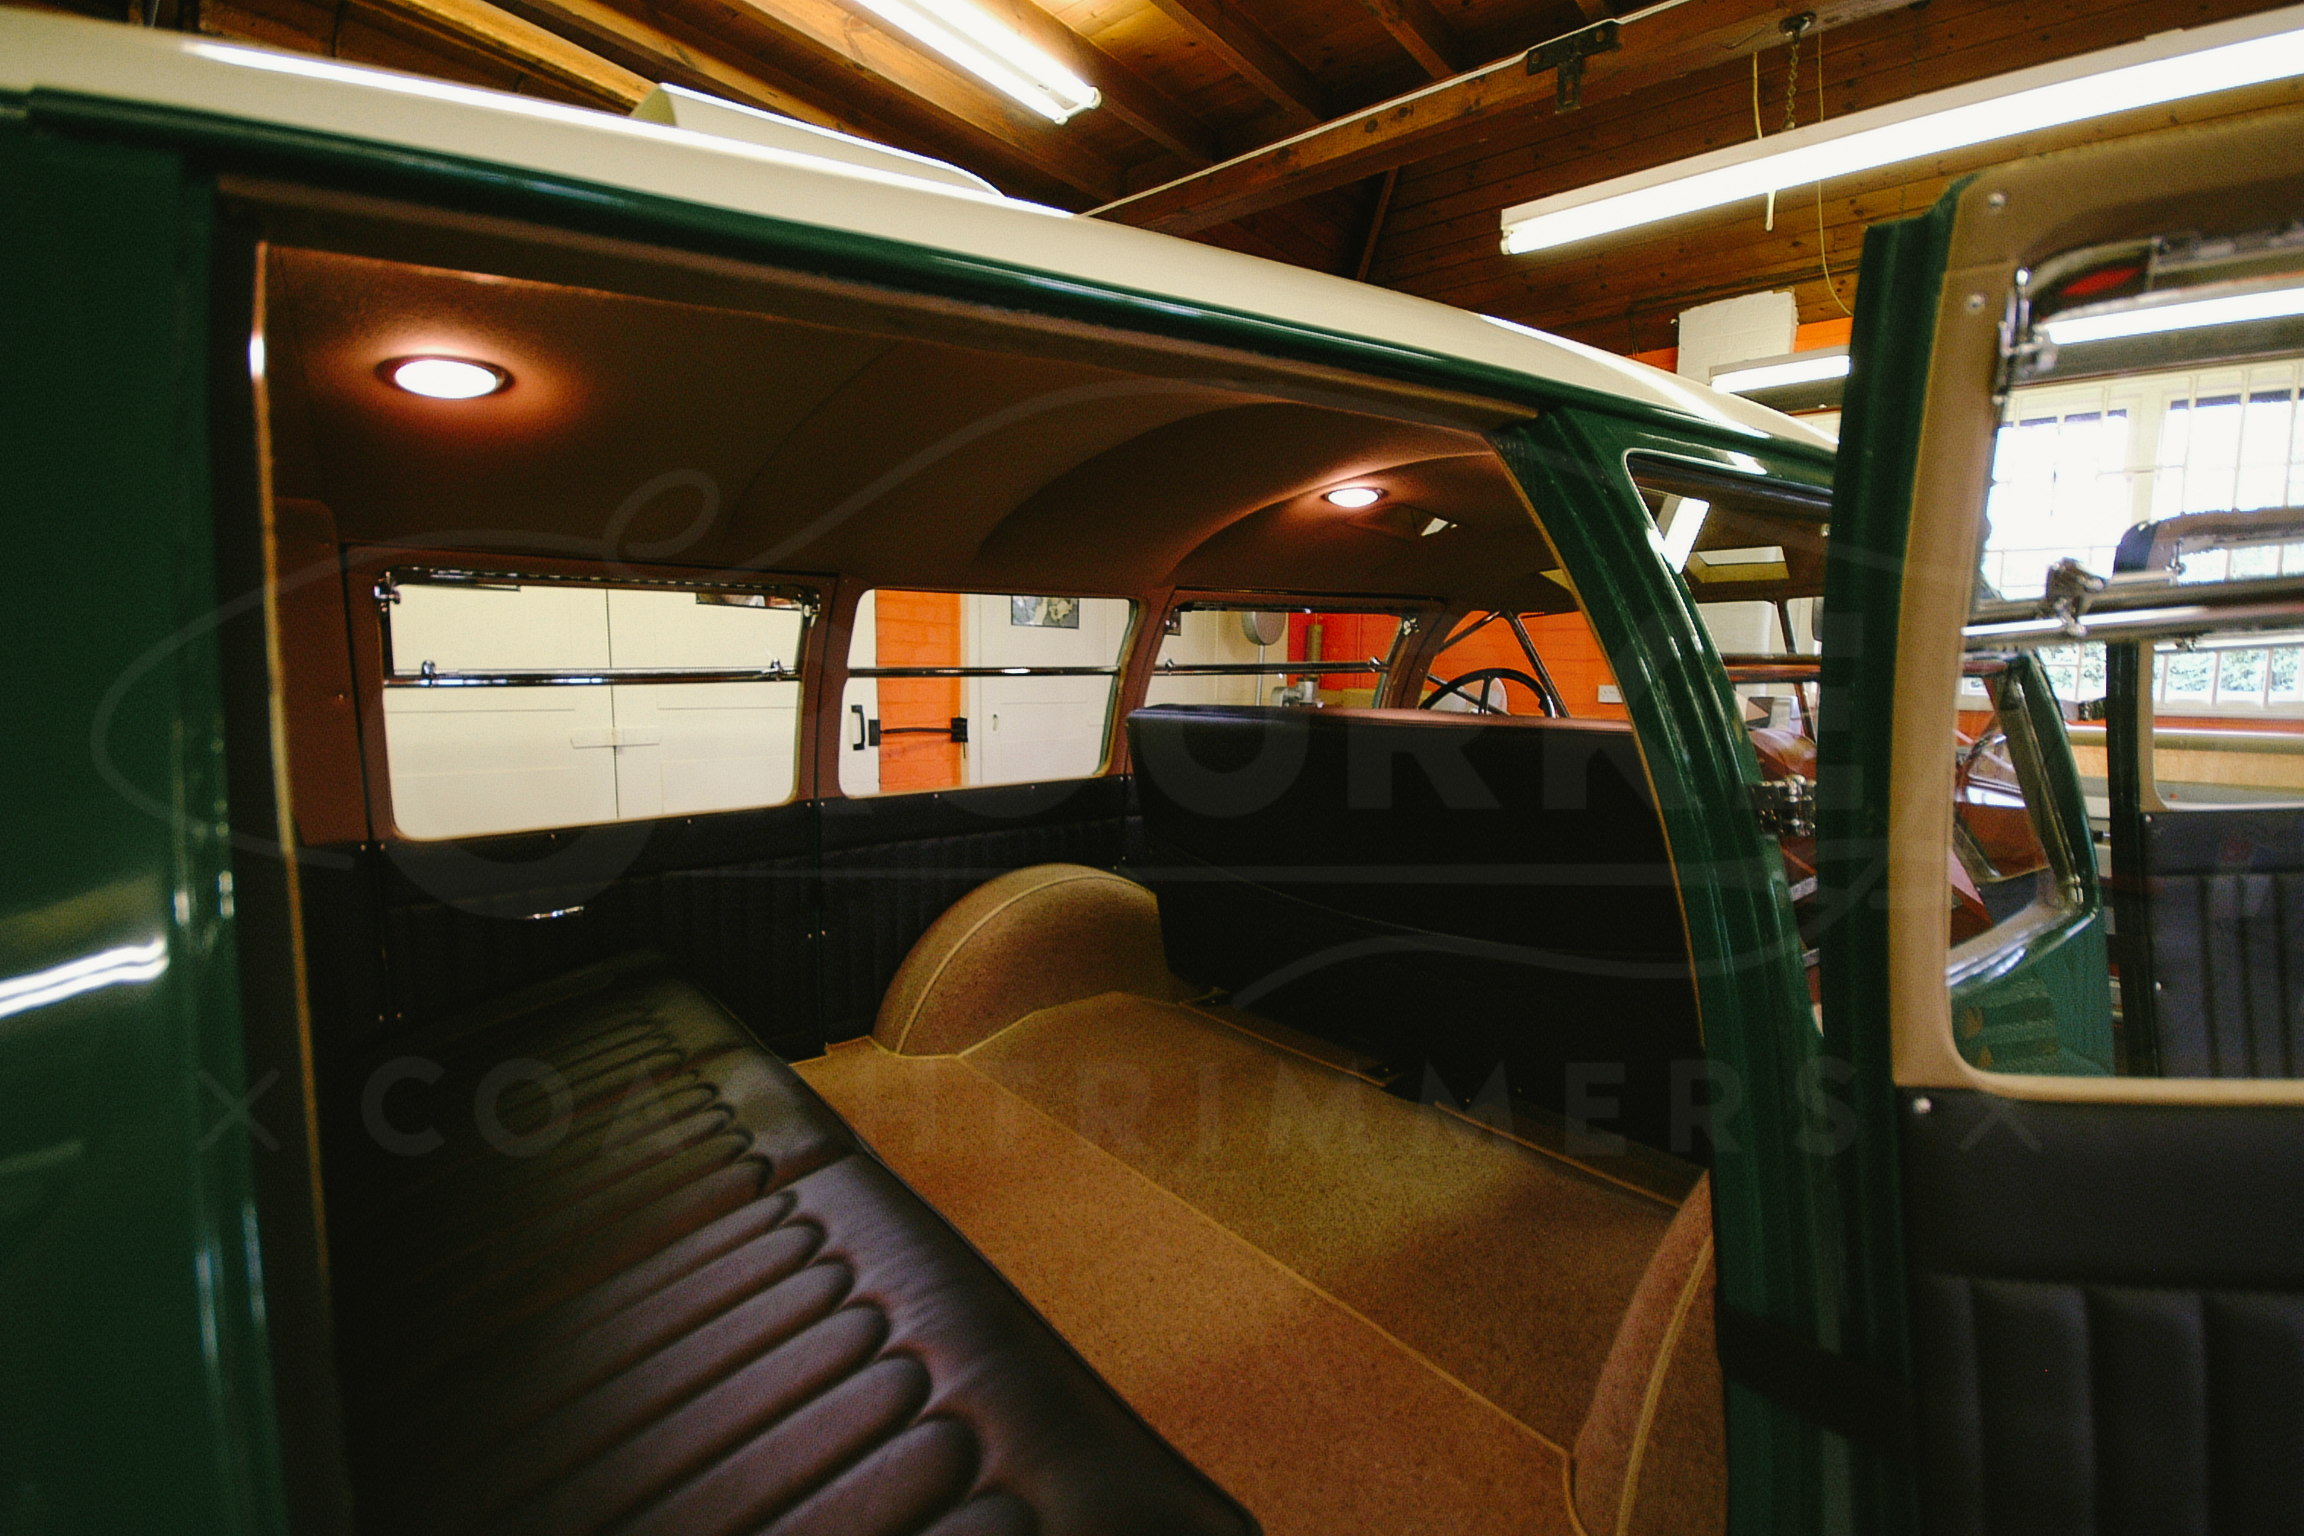 o-rourke-coachtrimmers-dymaxion-car-3-12.jpg